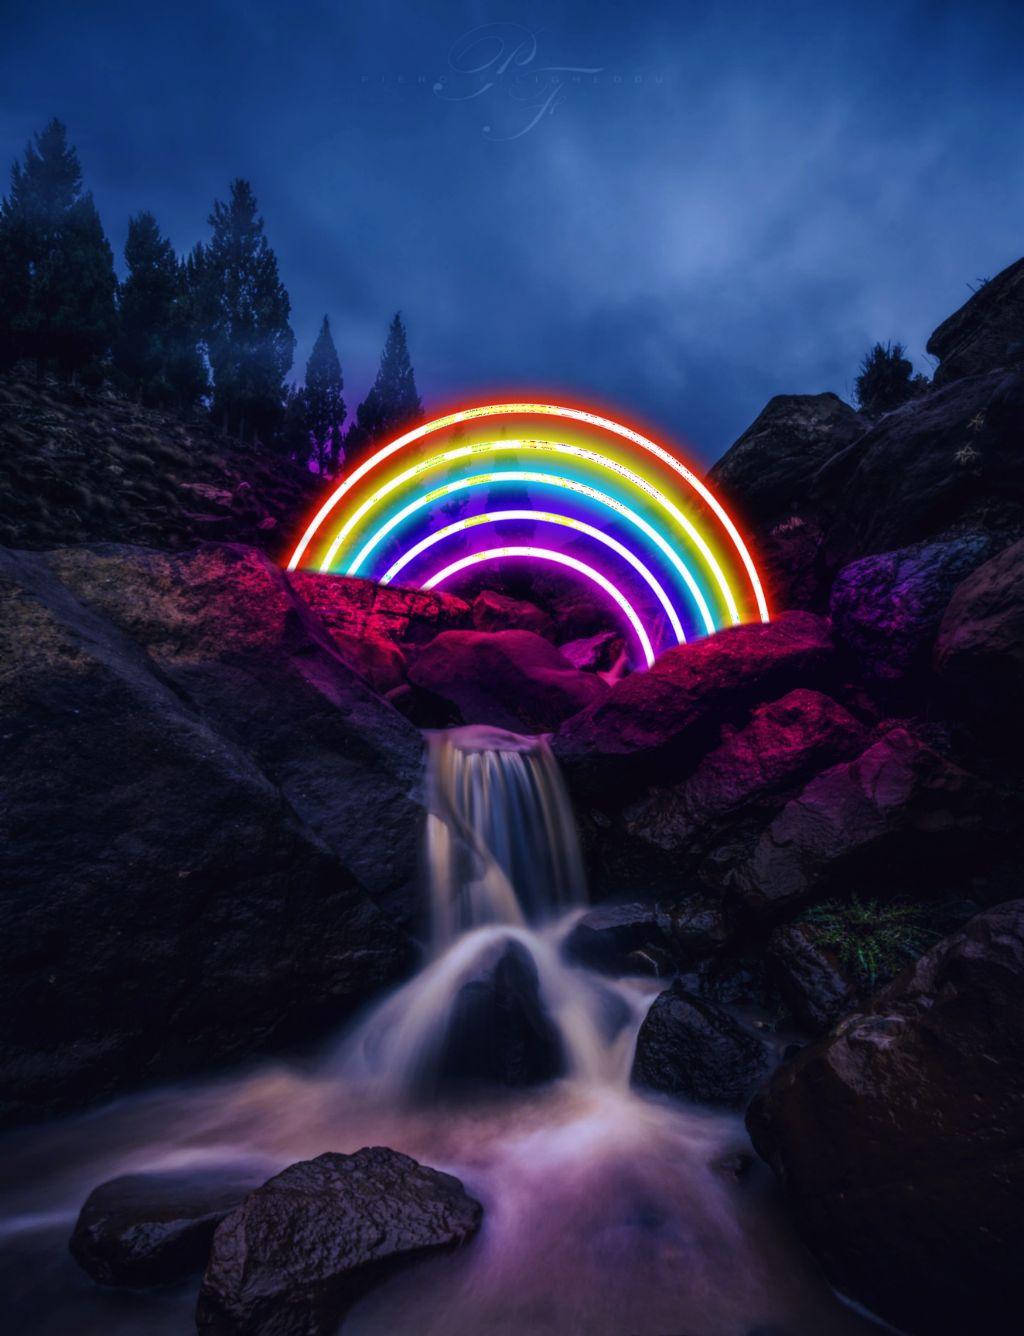 #freetoedit #rainbow #surreal #glow #millennialfltr